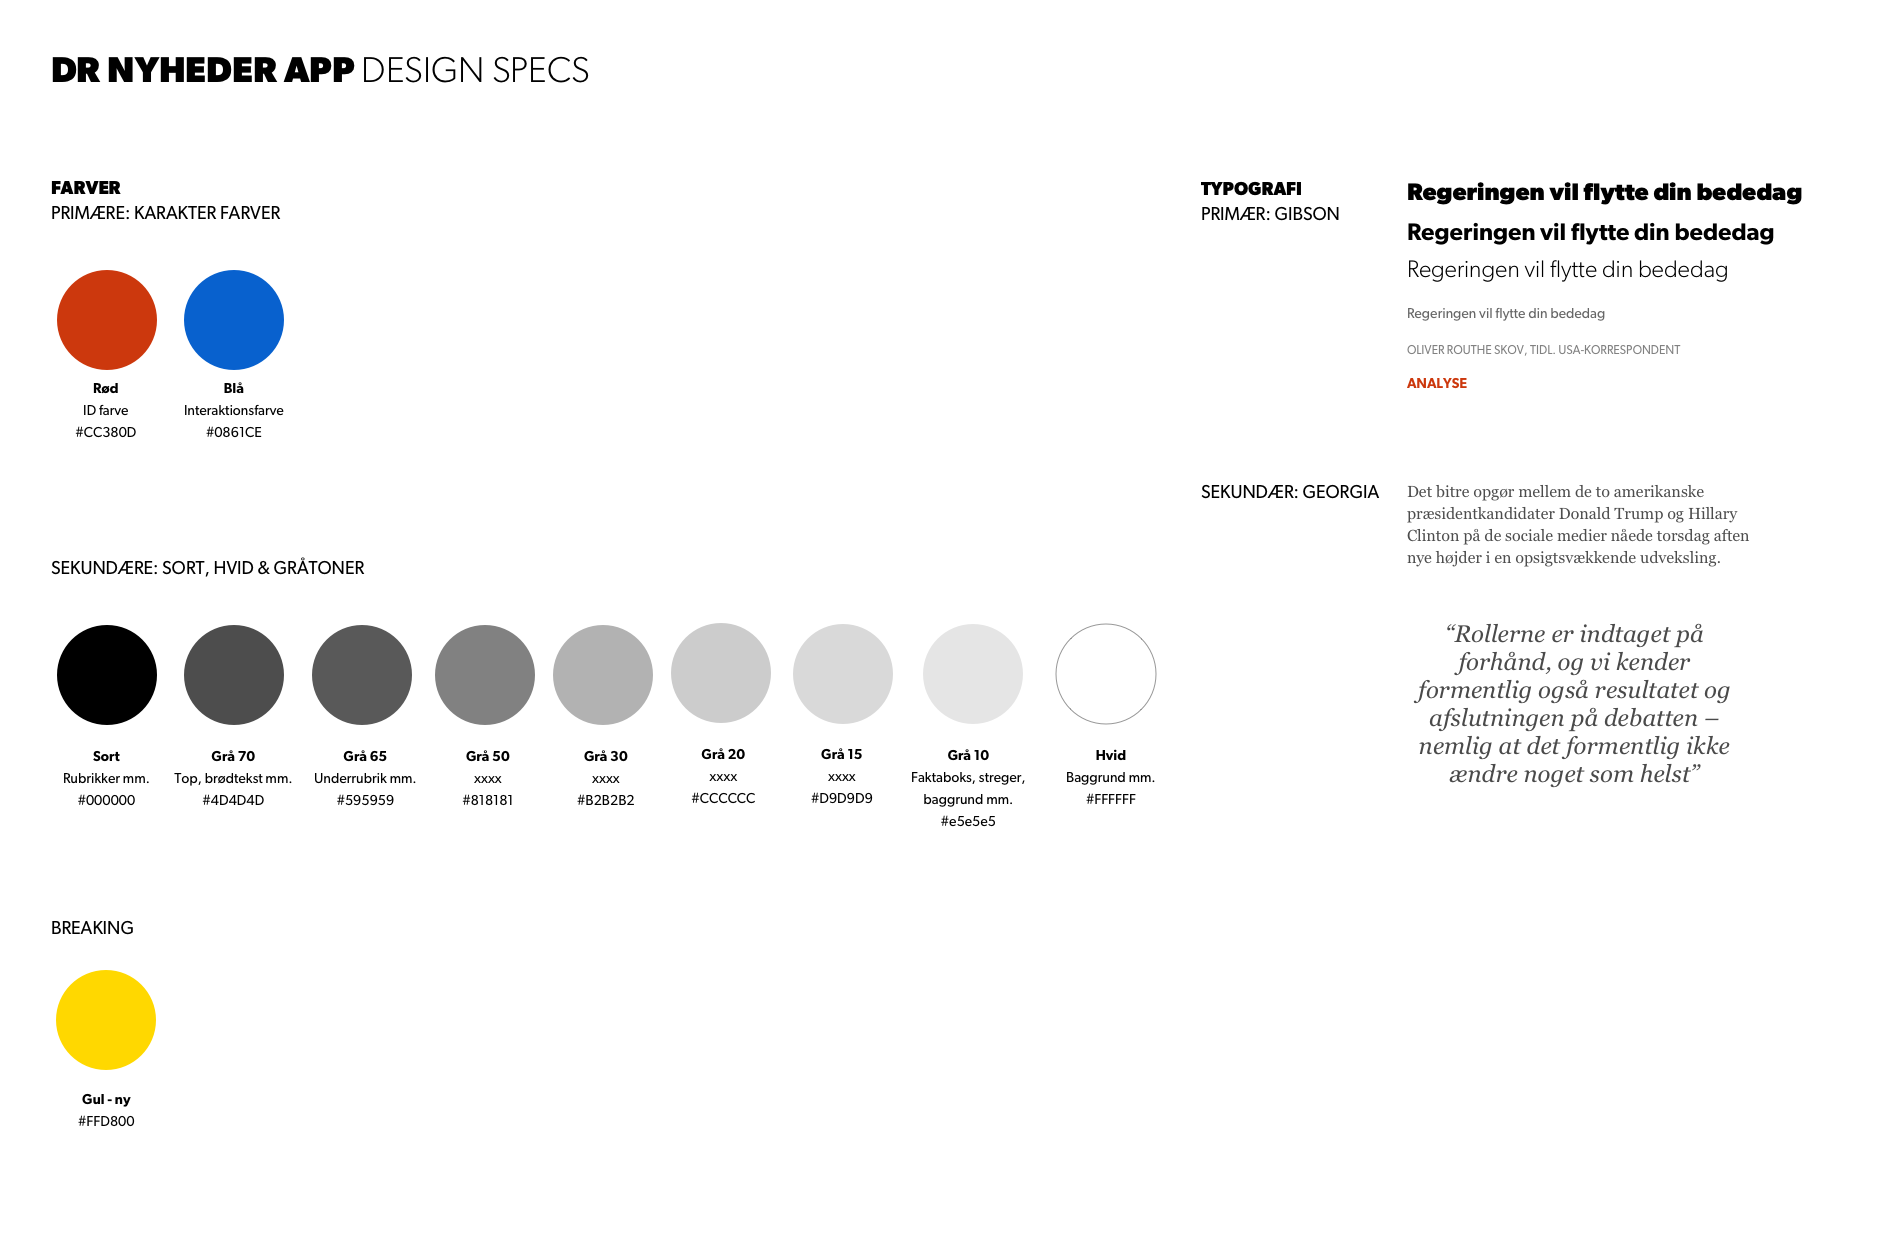 2016-12-06_DR_NyhederApp_DesignSpecs.png